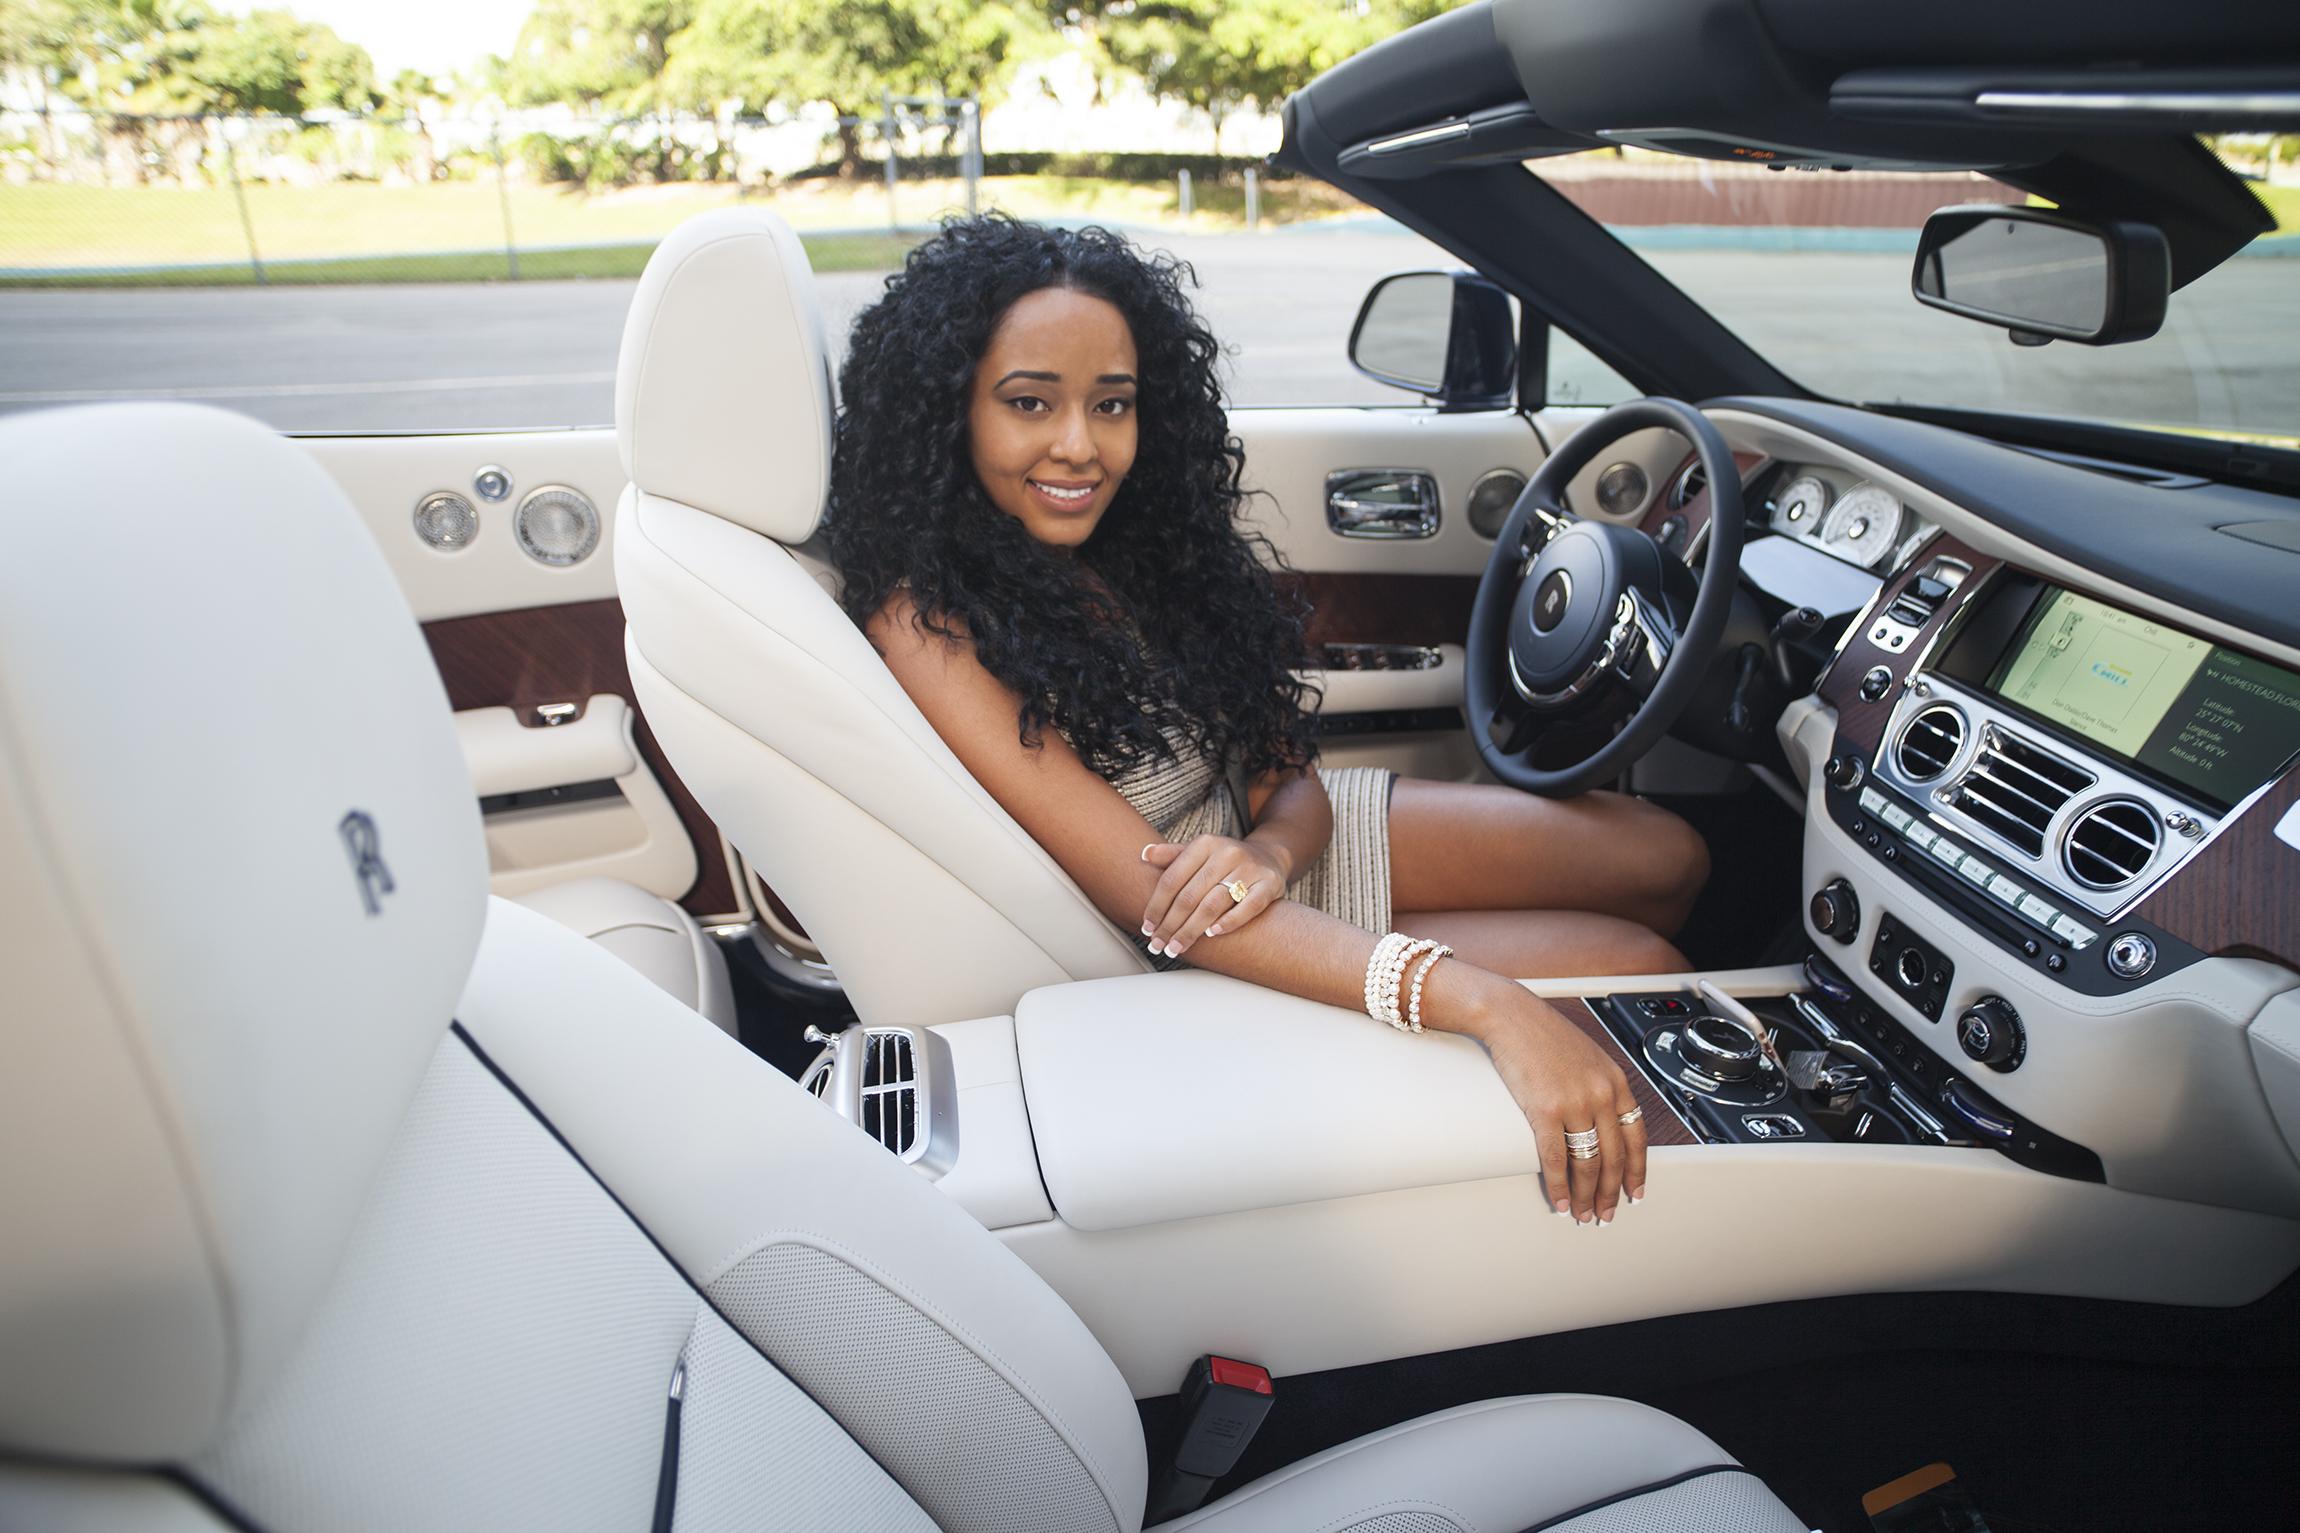 Rolls-Royce Homestead Speedway Drive Event